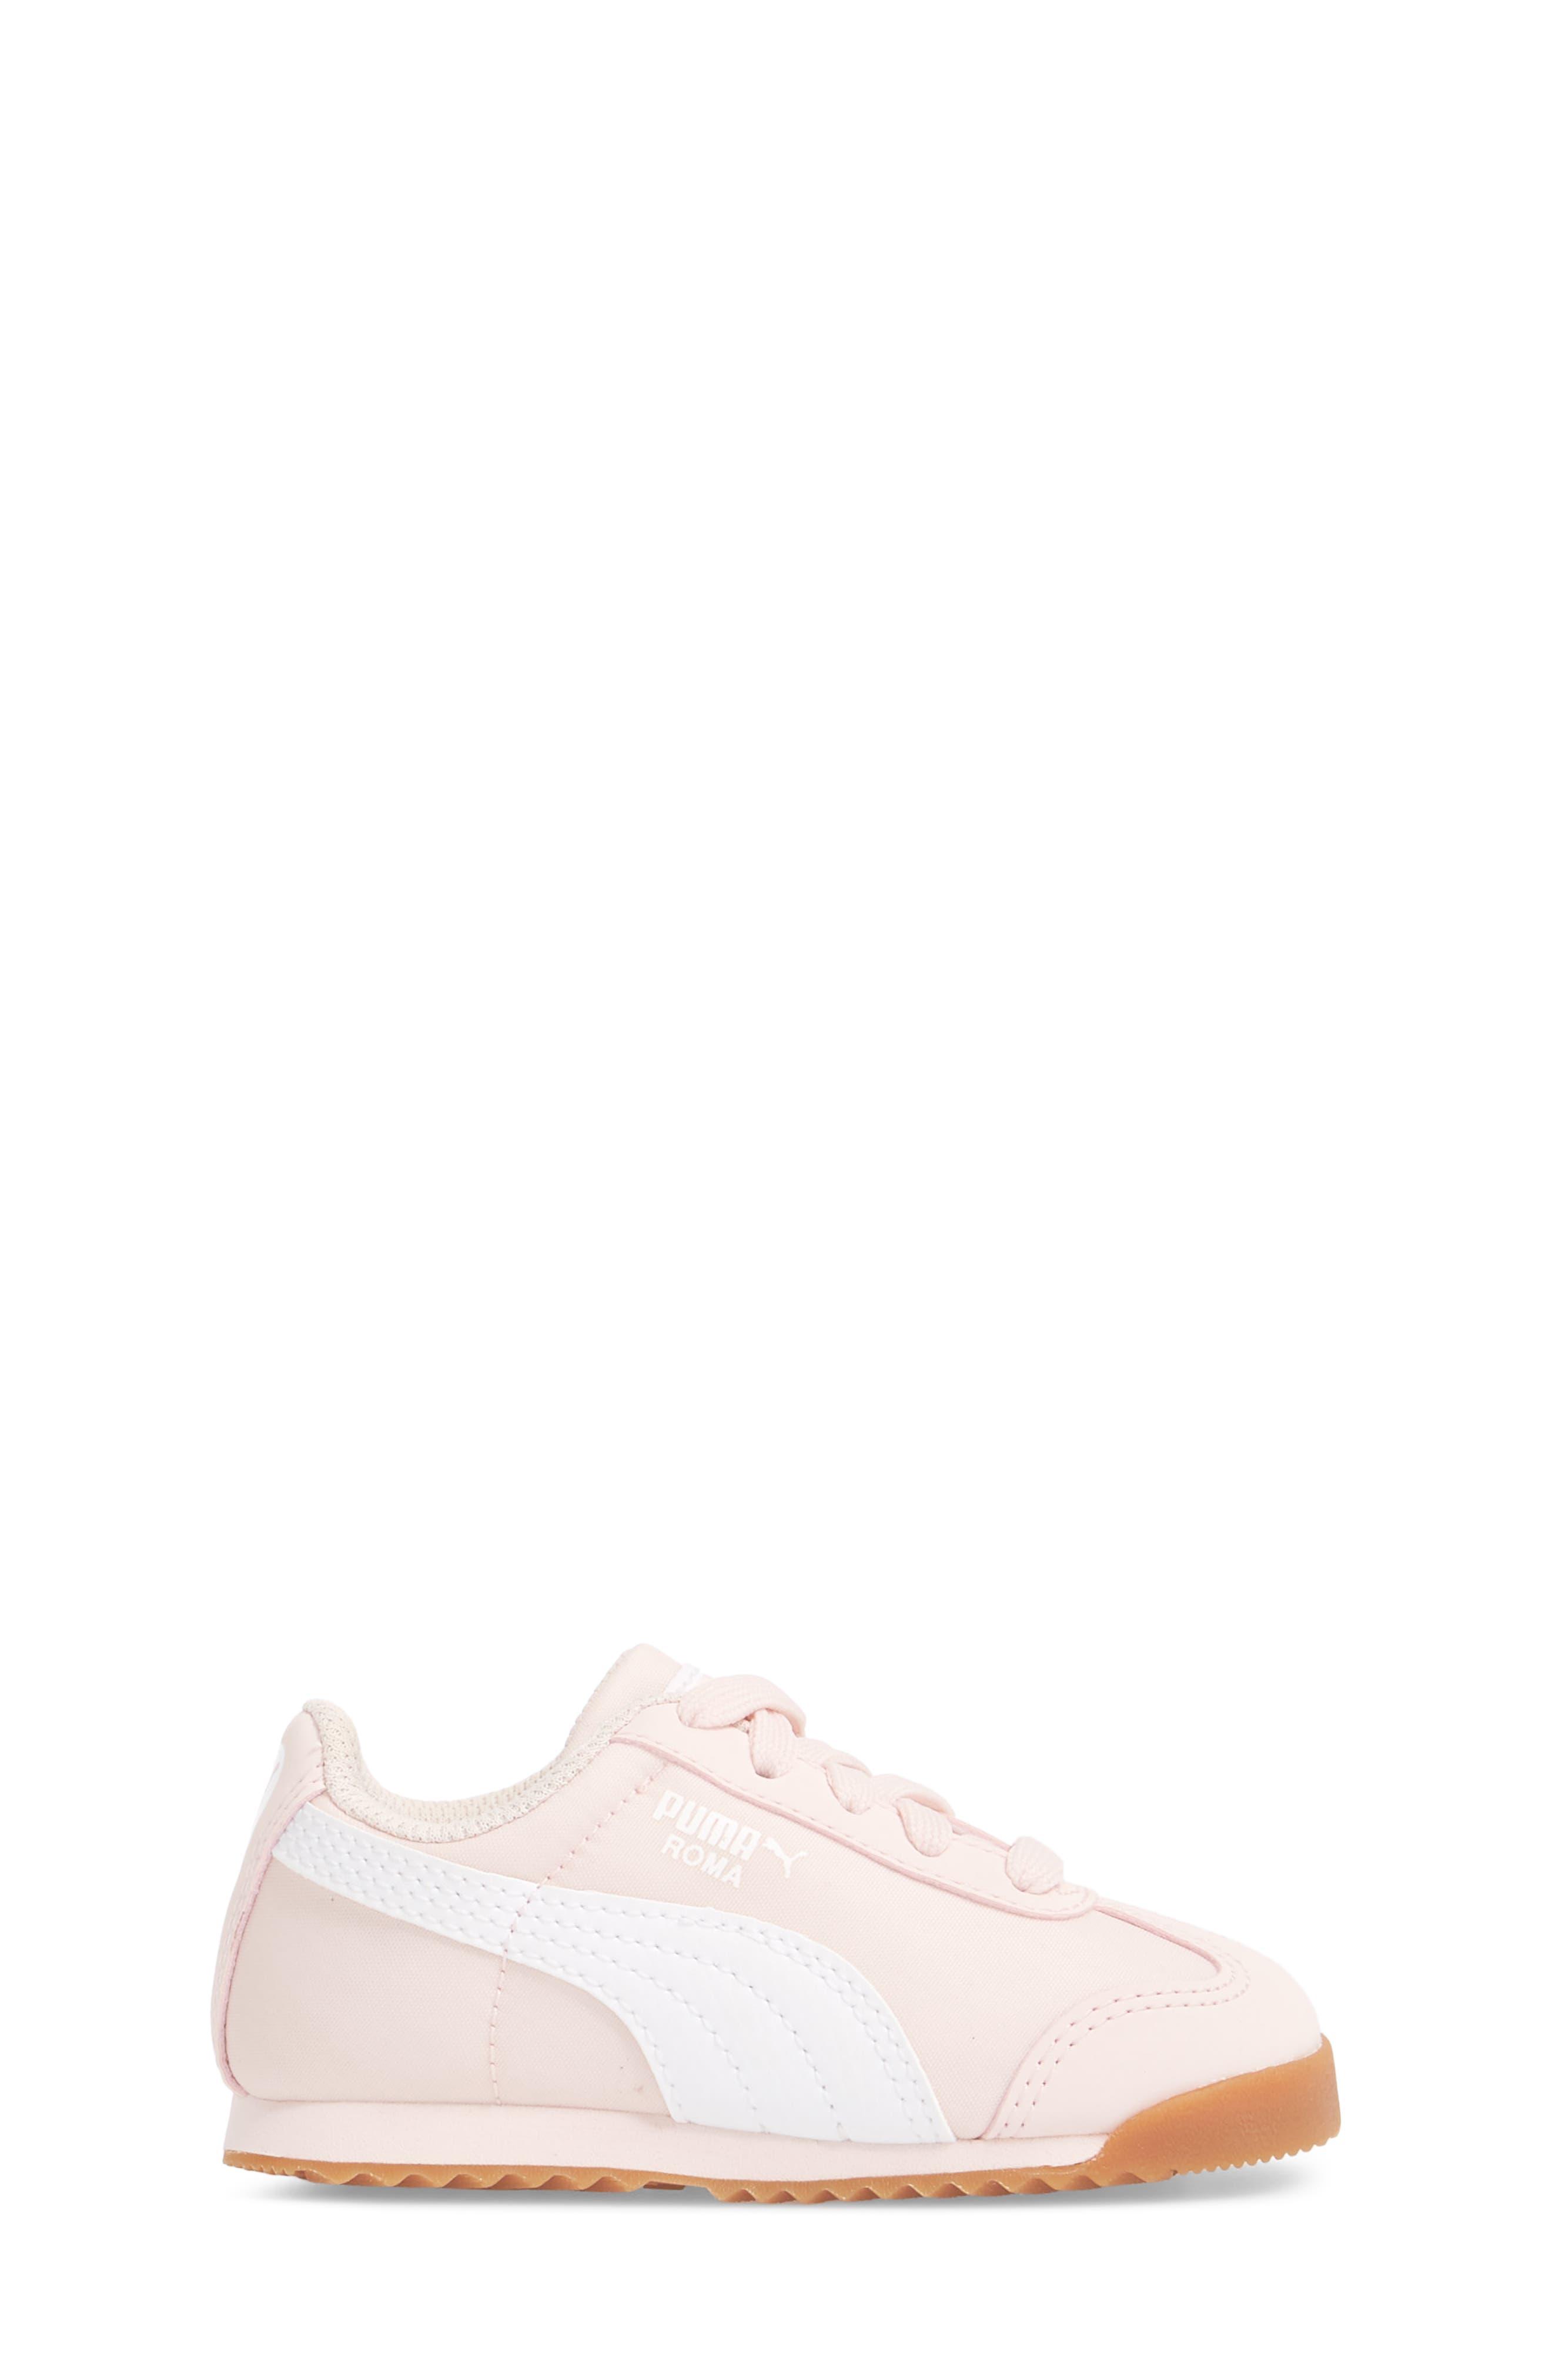 PUMA,                             Roma Basic Summer Sneaker,                             Alternate thumbnail 3, color,                             100